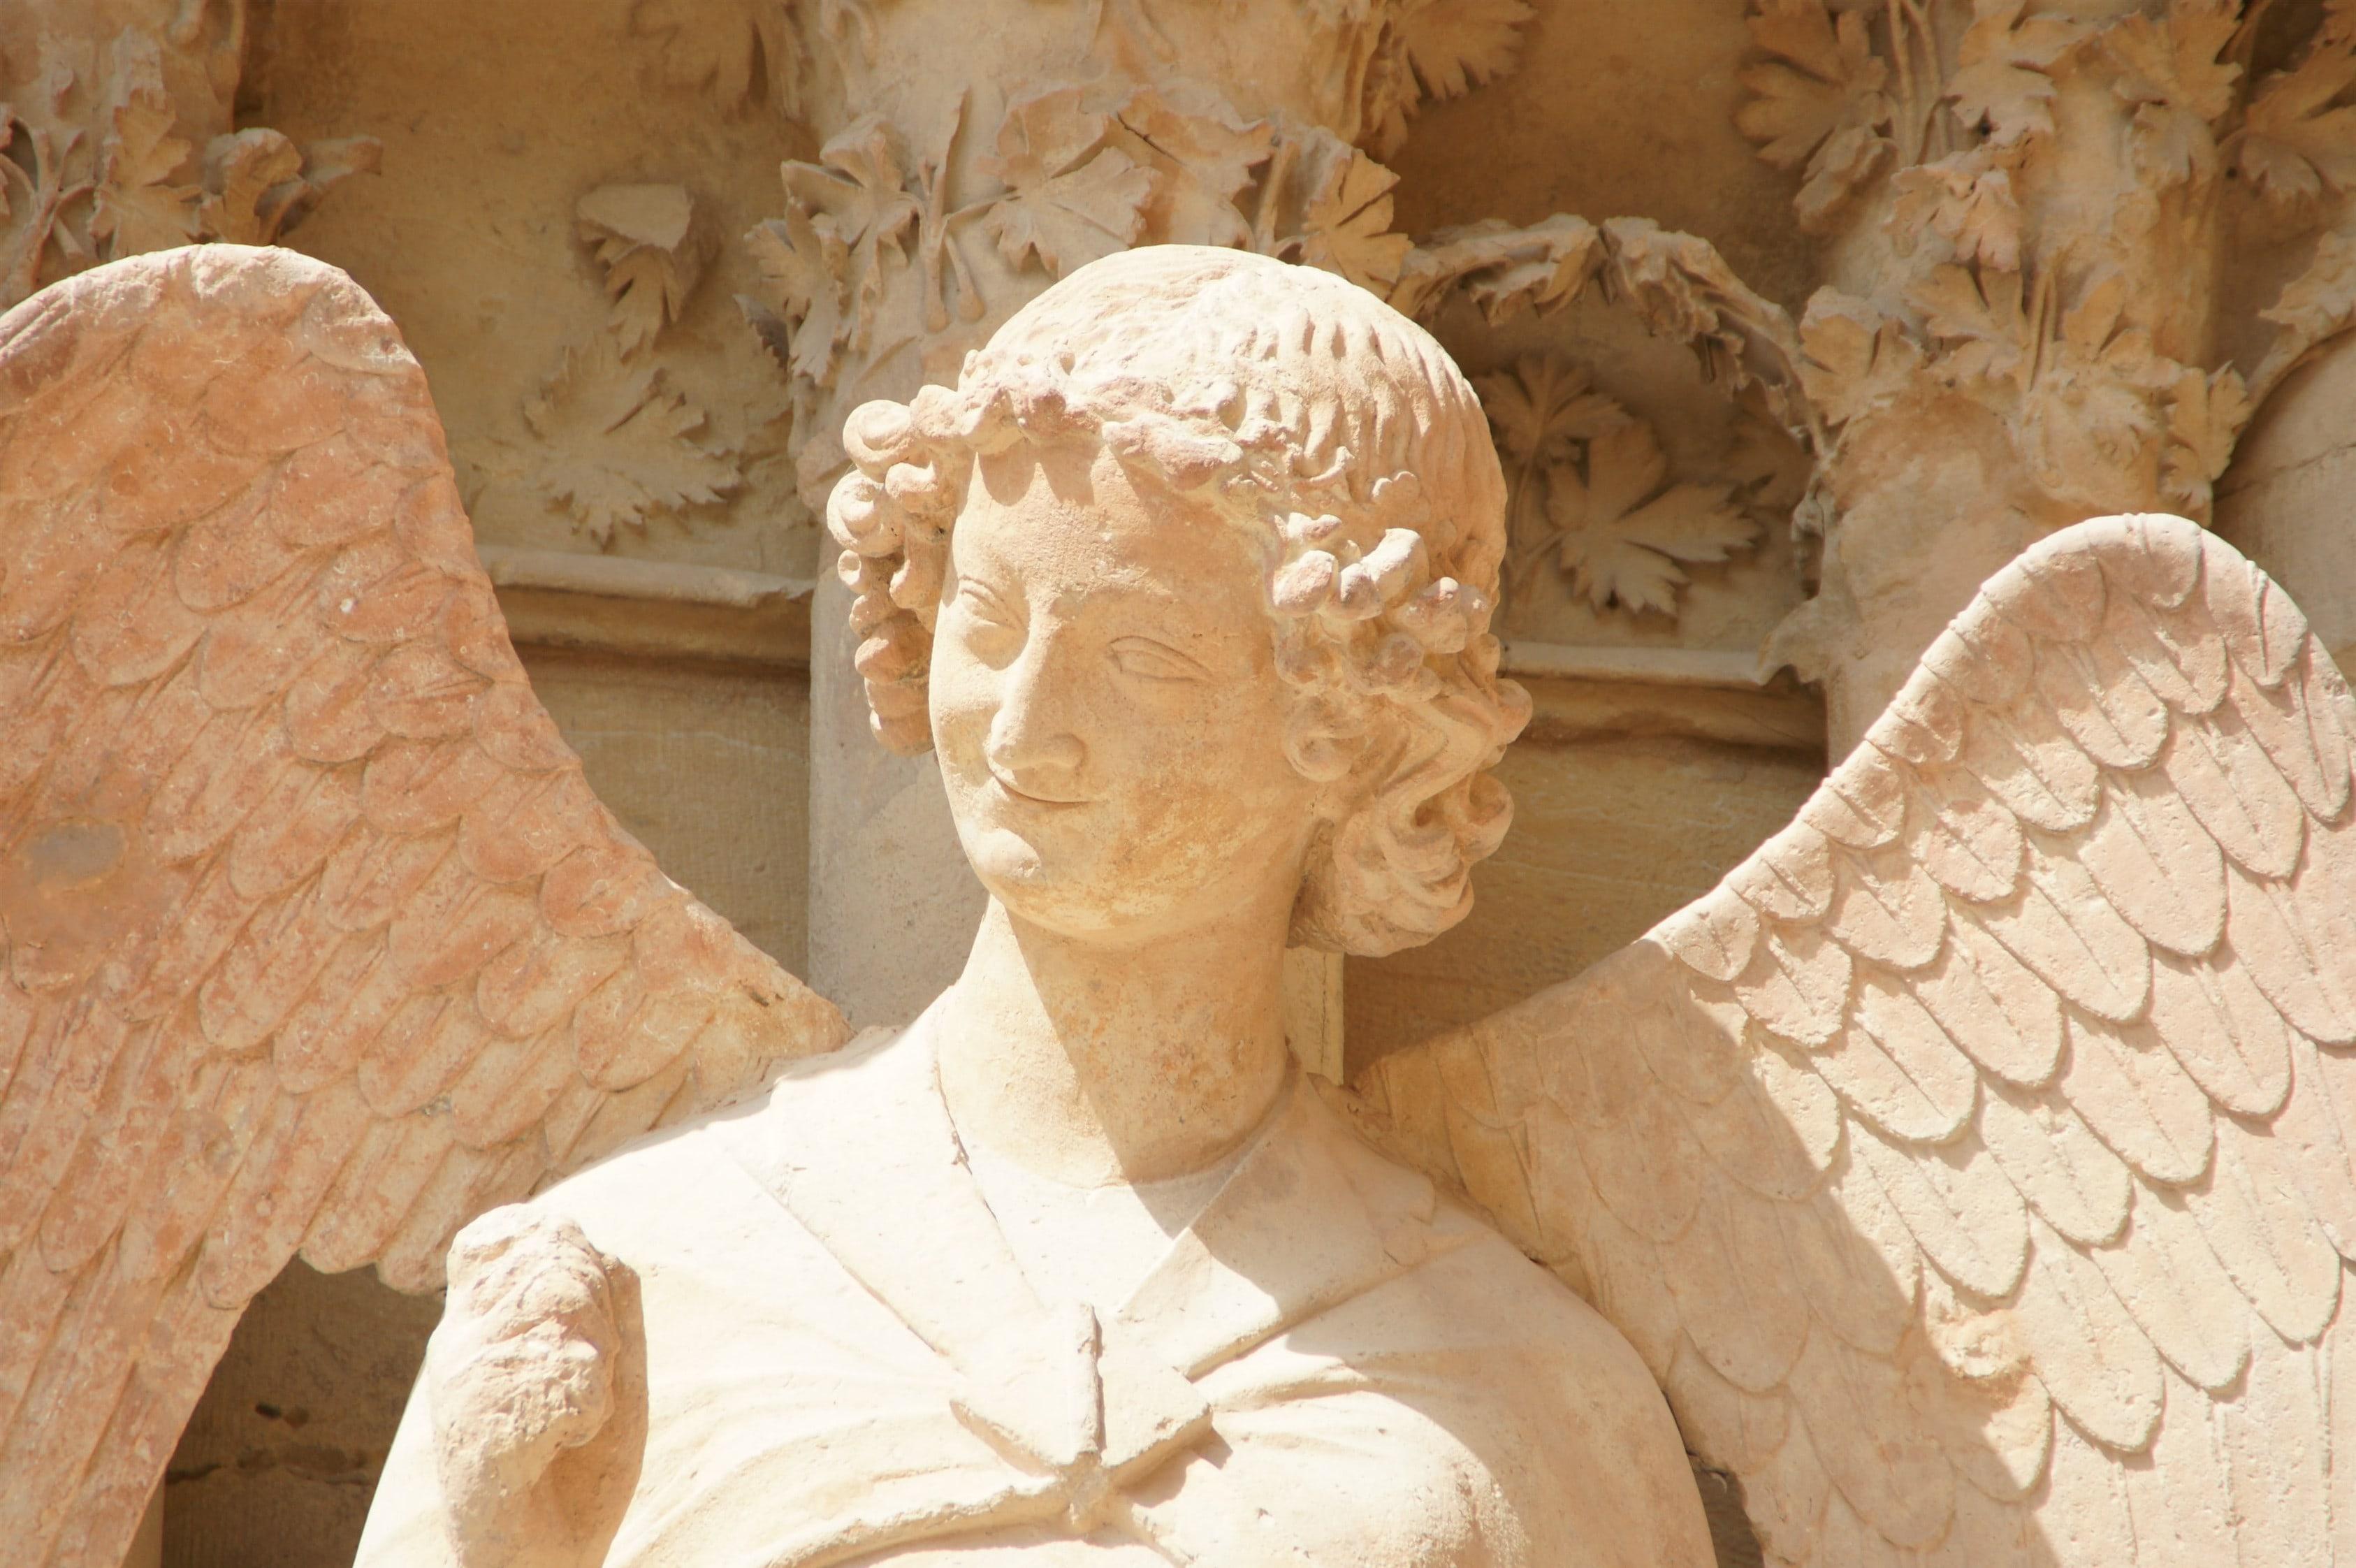 Улыбающийся ангел. Реймский собор.